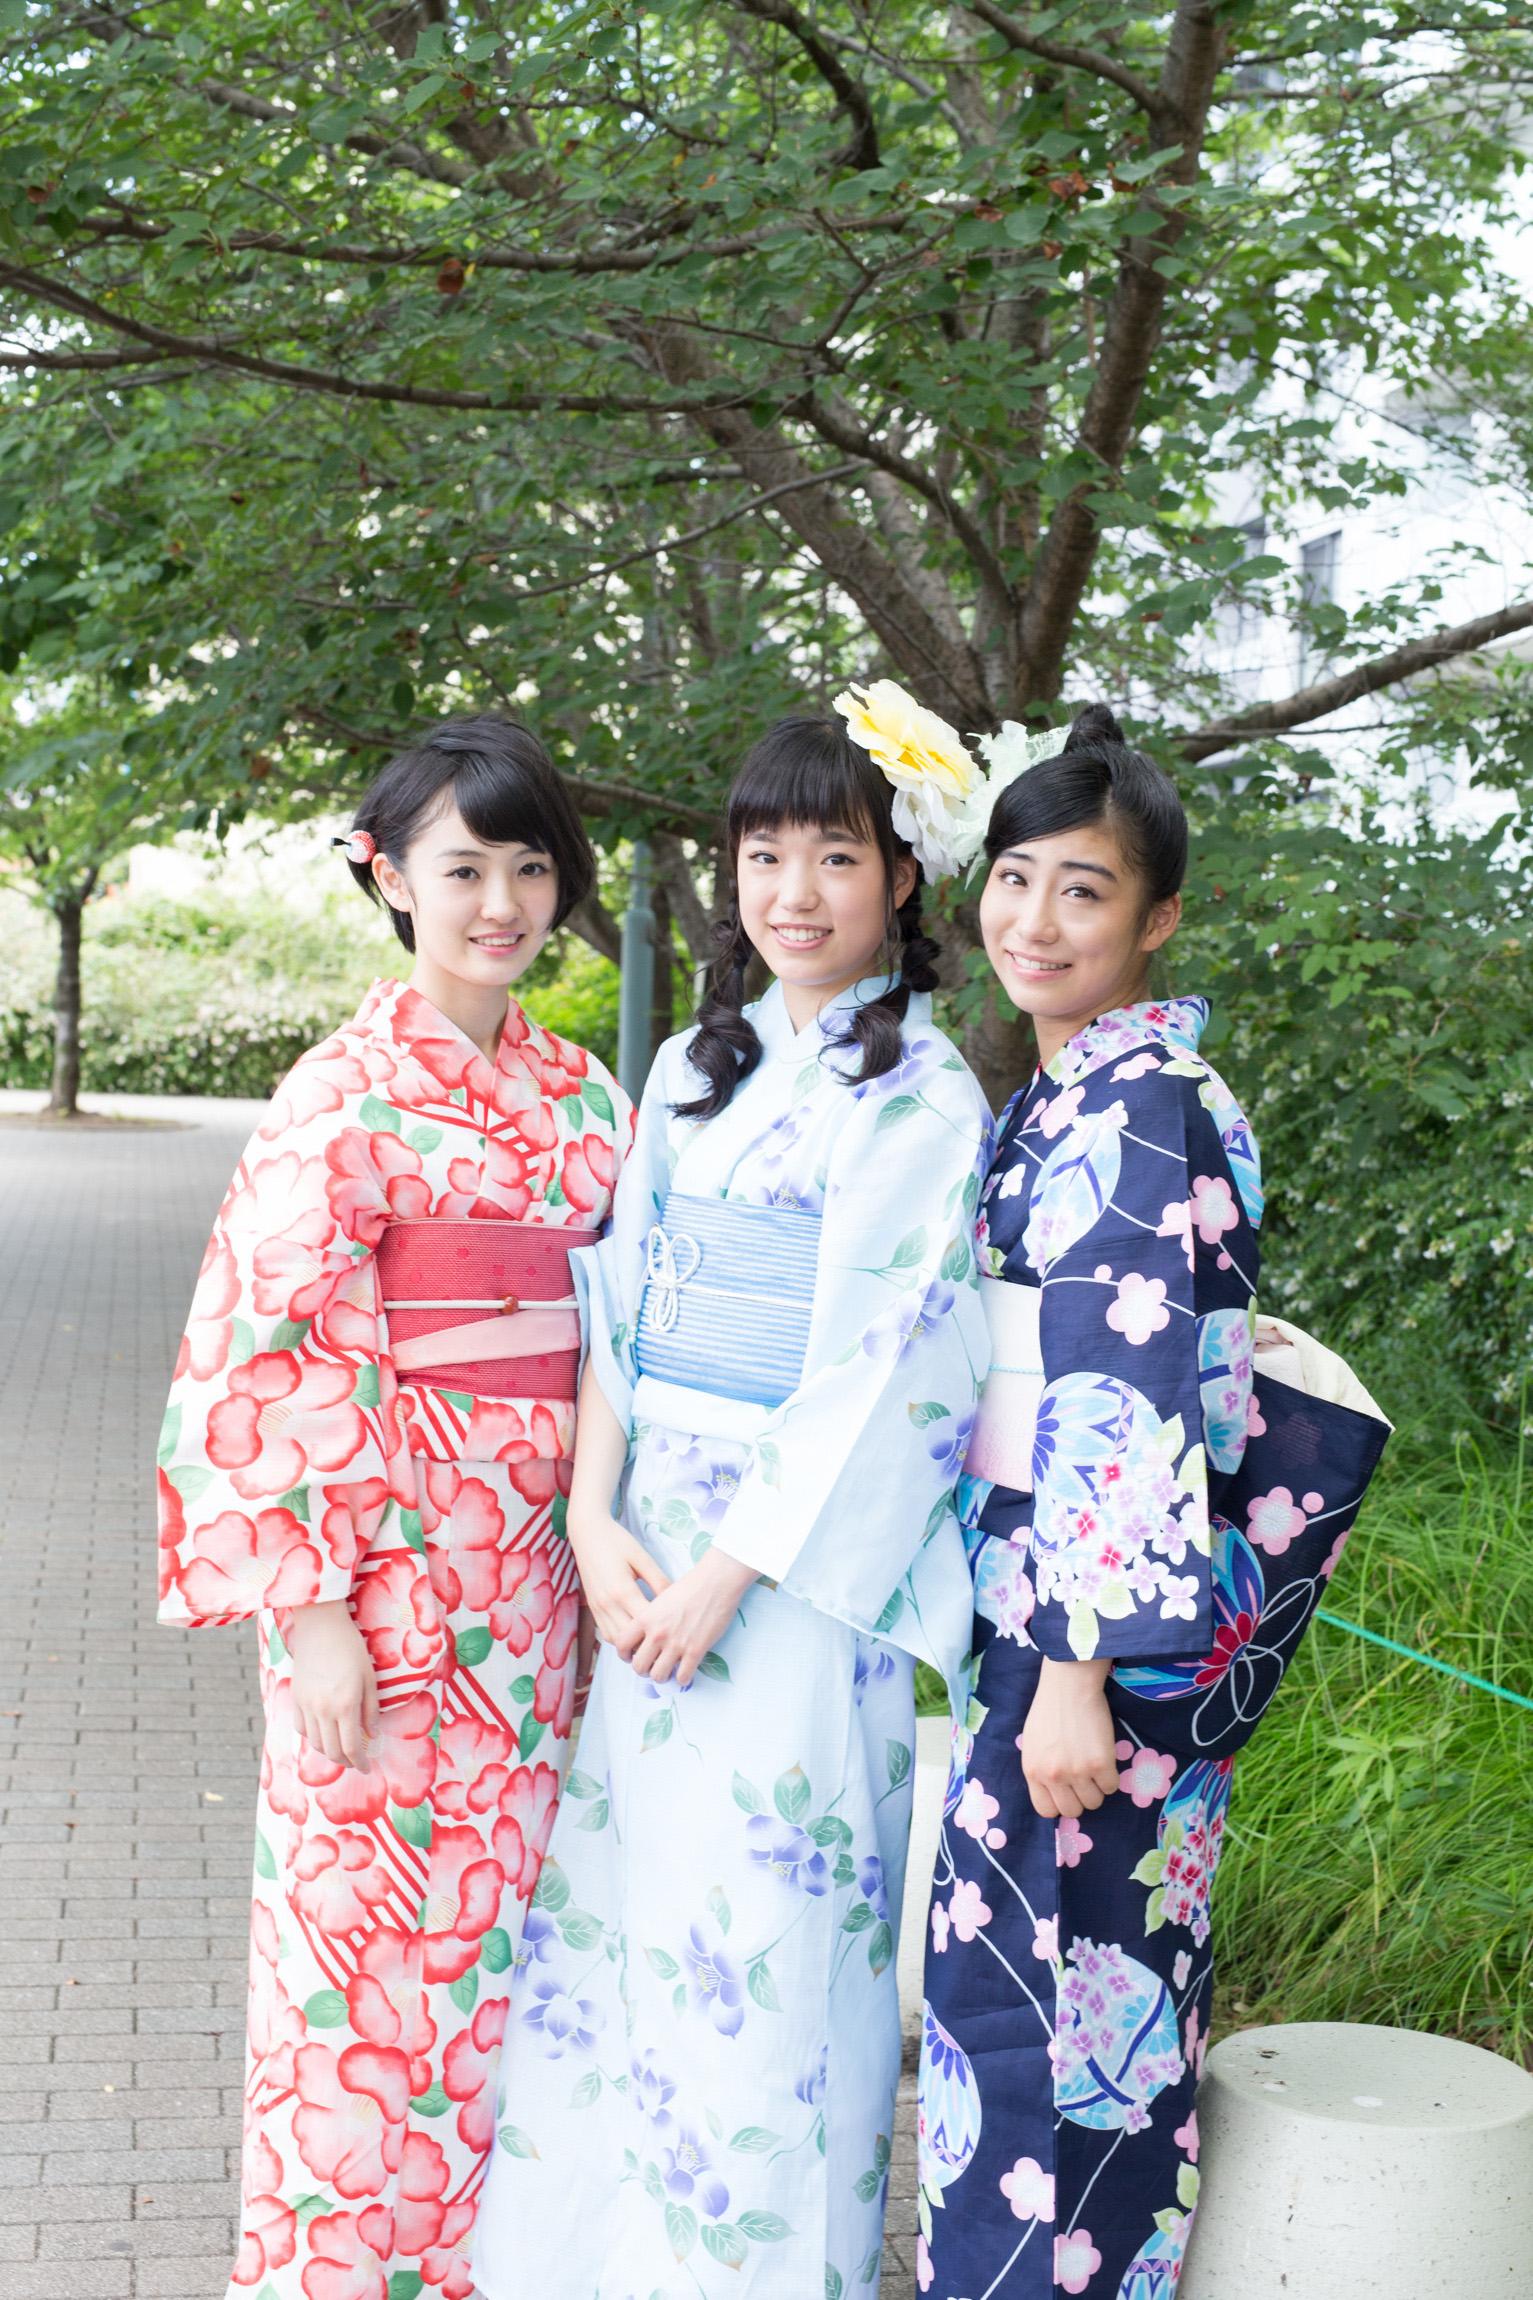 20160831_teamsyachihoko06_offshot_toukou